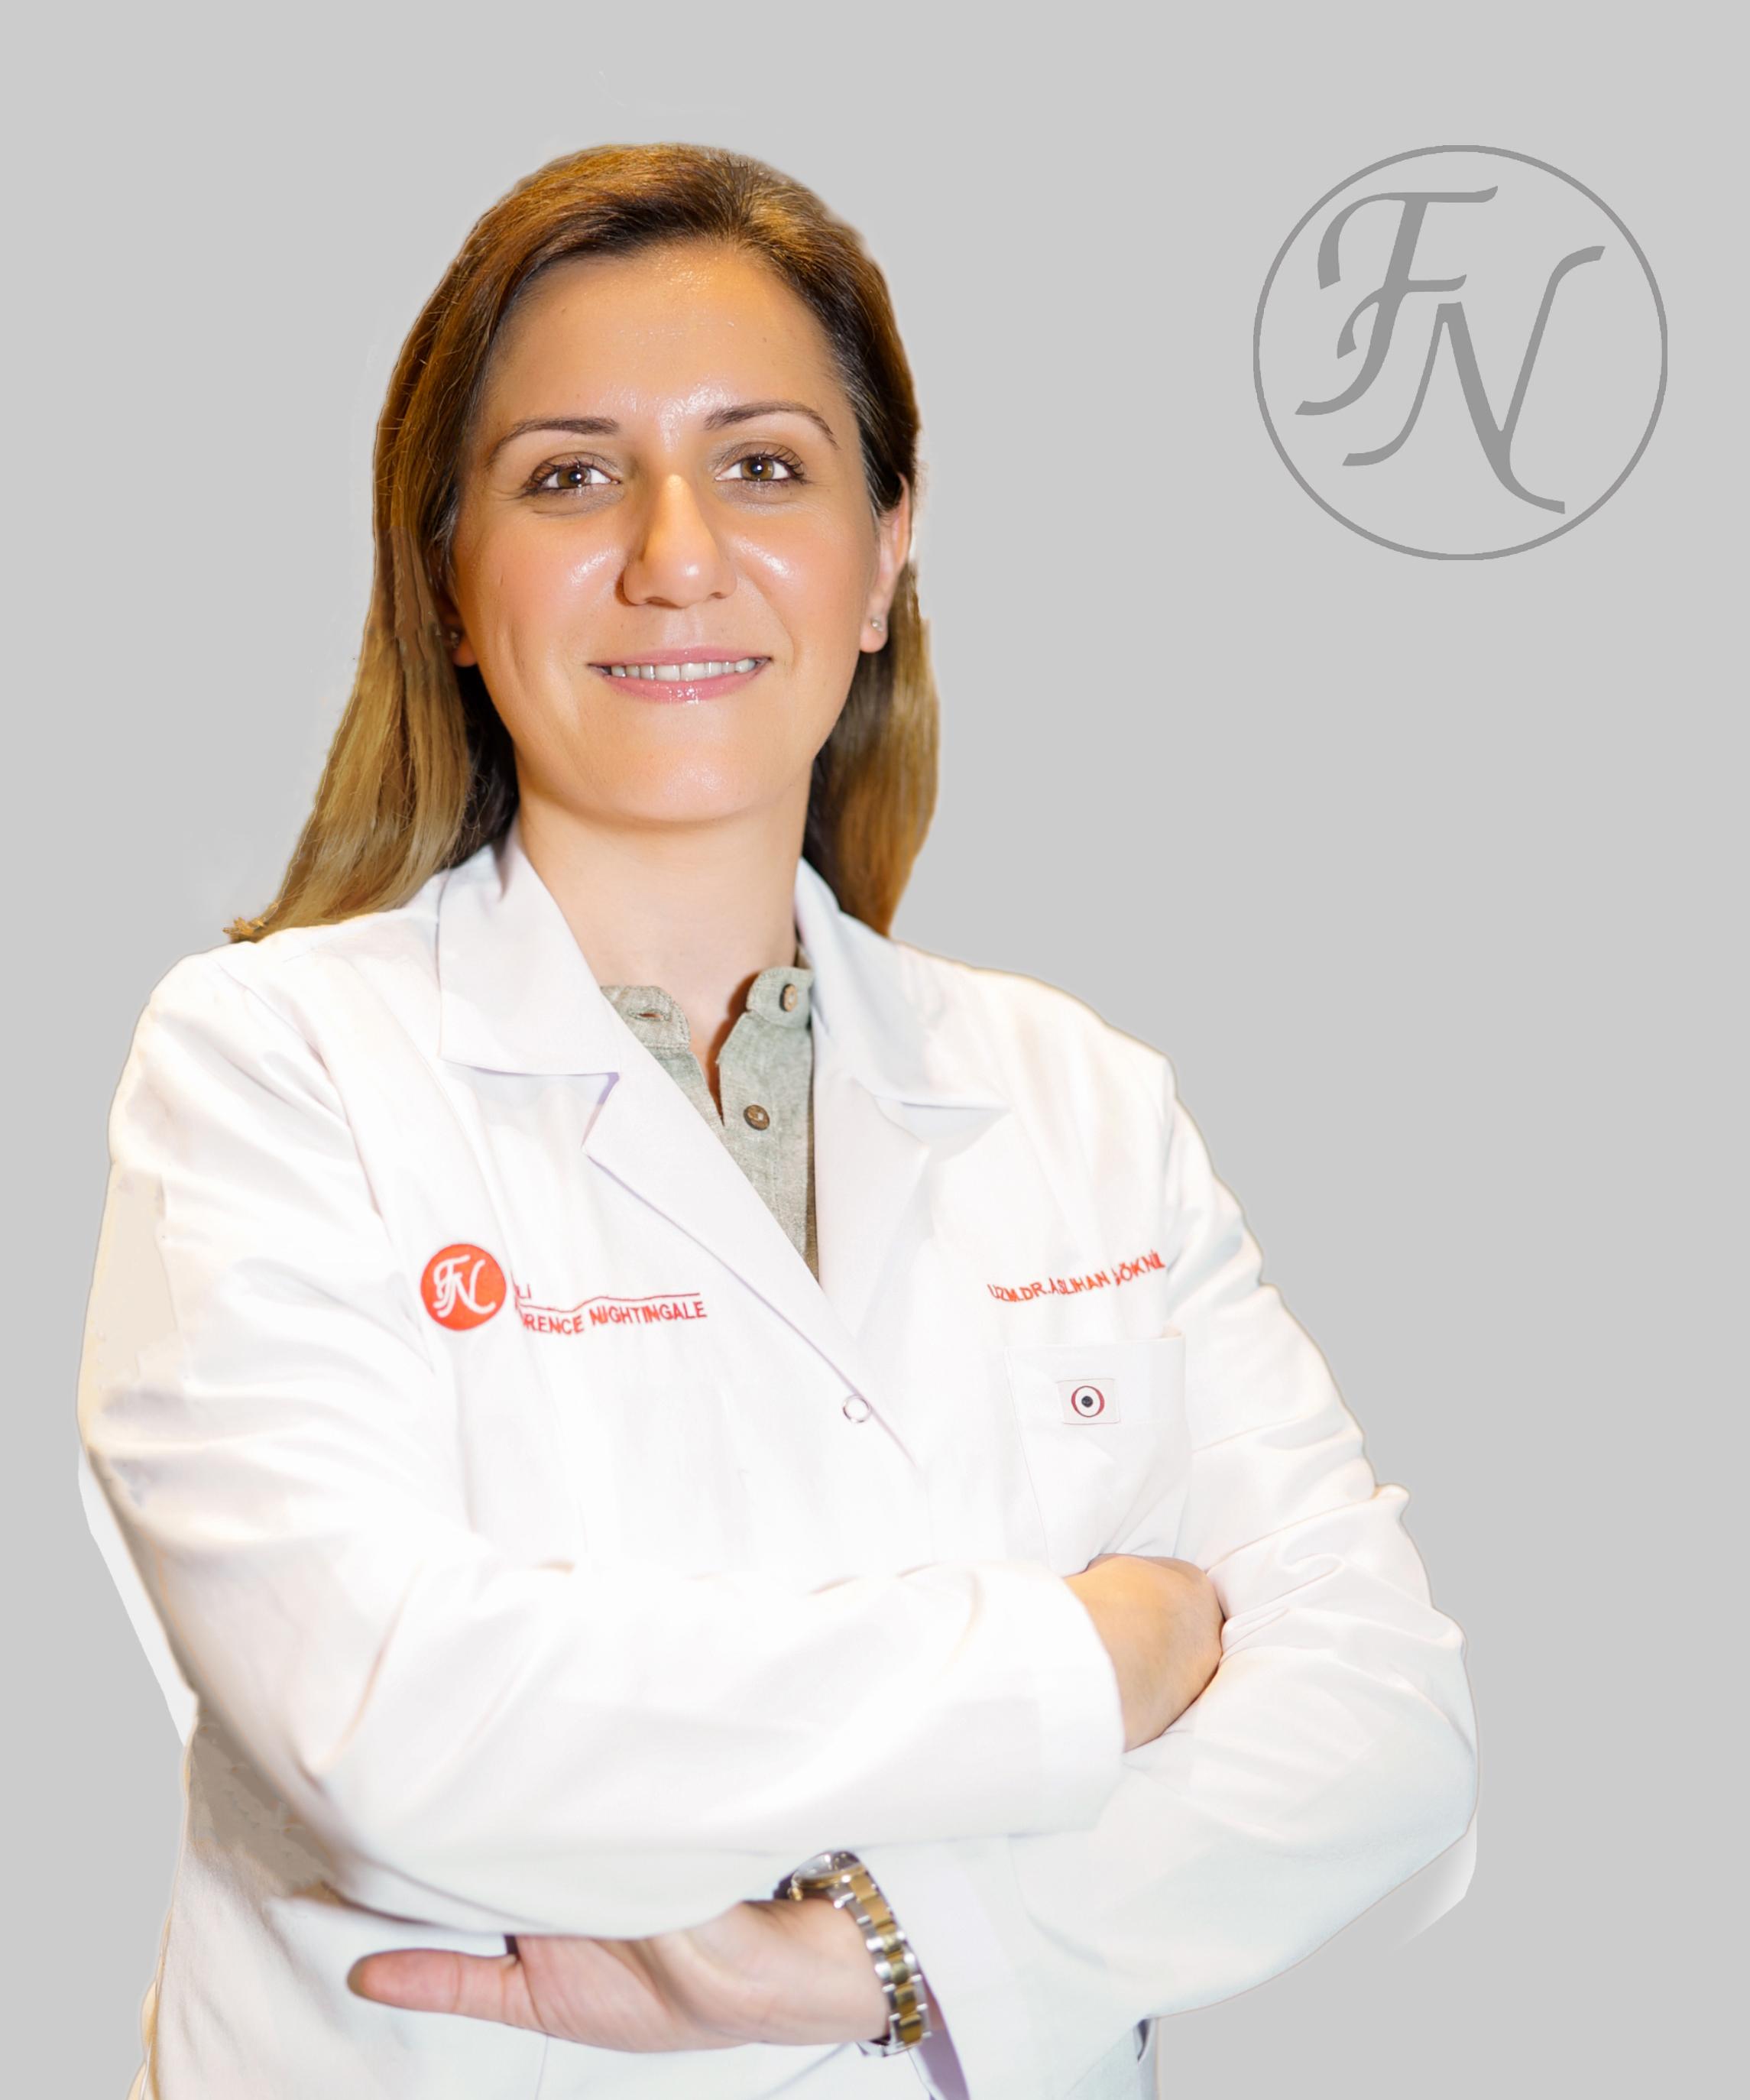 Dr. Aslıhan ERAN ERGÖKNİL